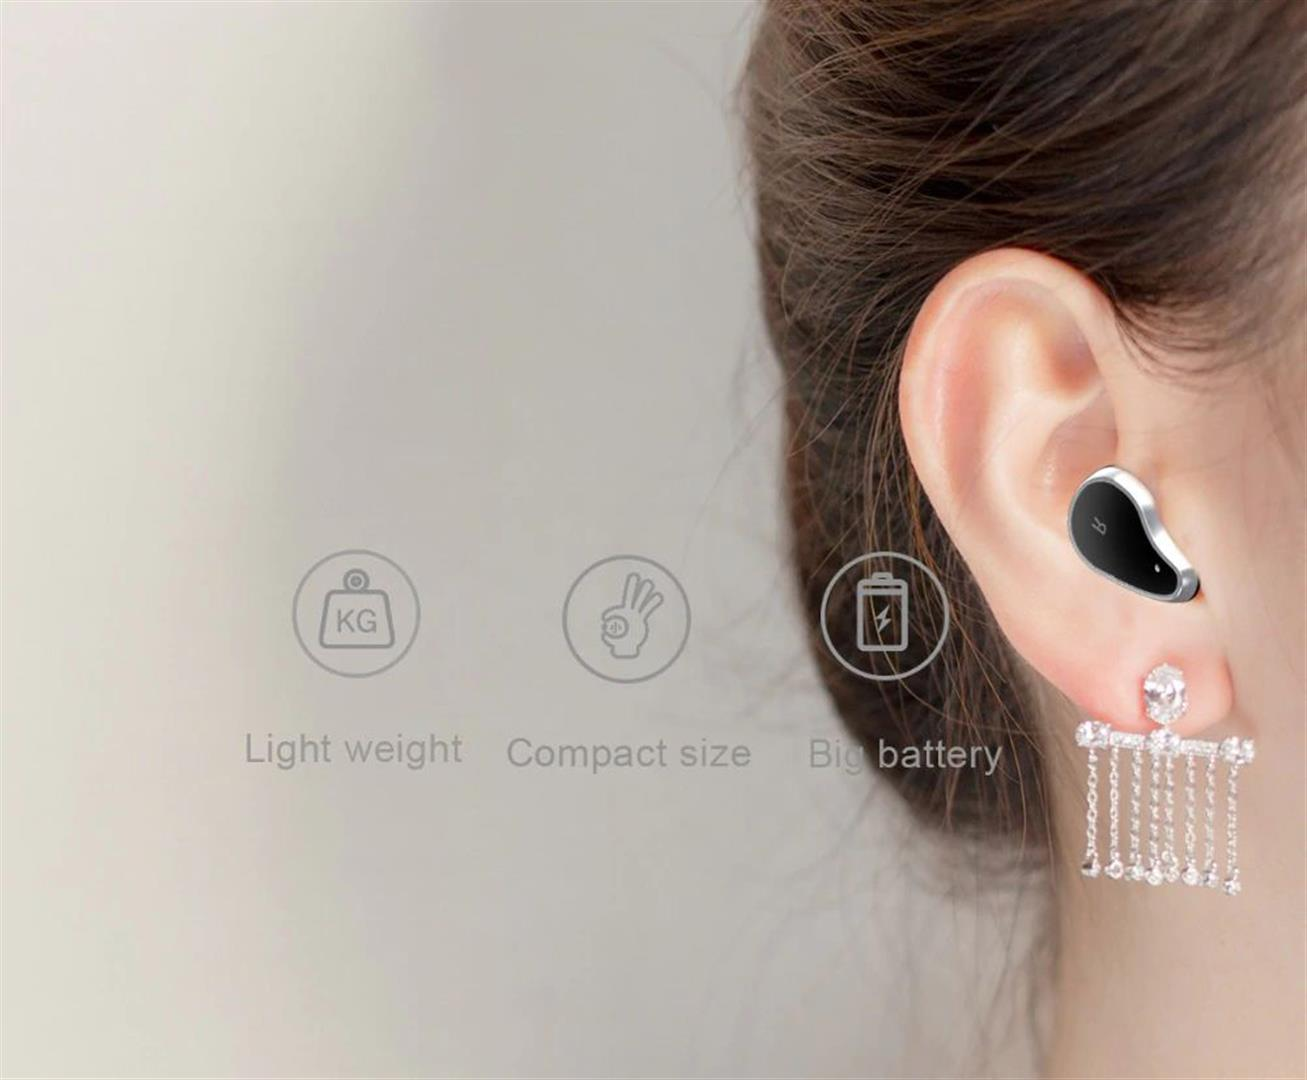 Fitness Smart Watch with Bluetooth Earphones - 11